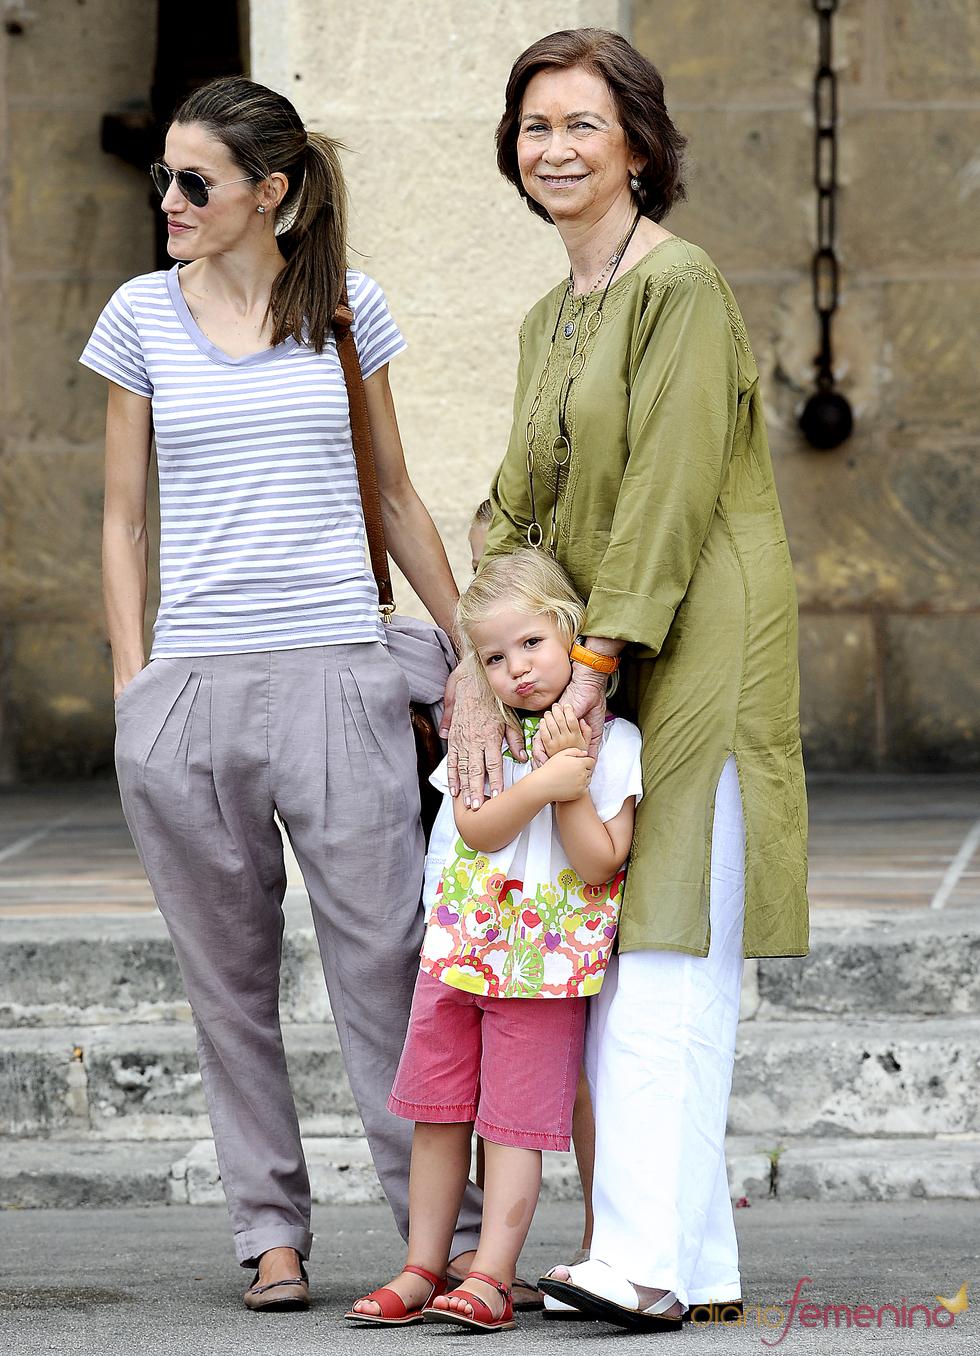 La reina abraza cariñosa a la infanta Sofia